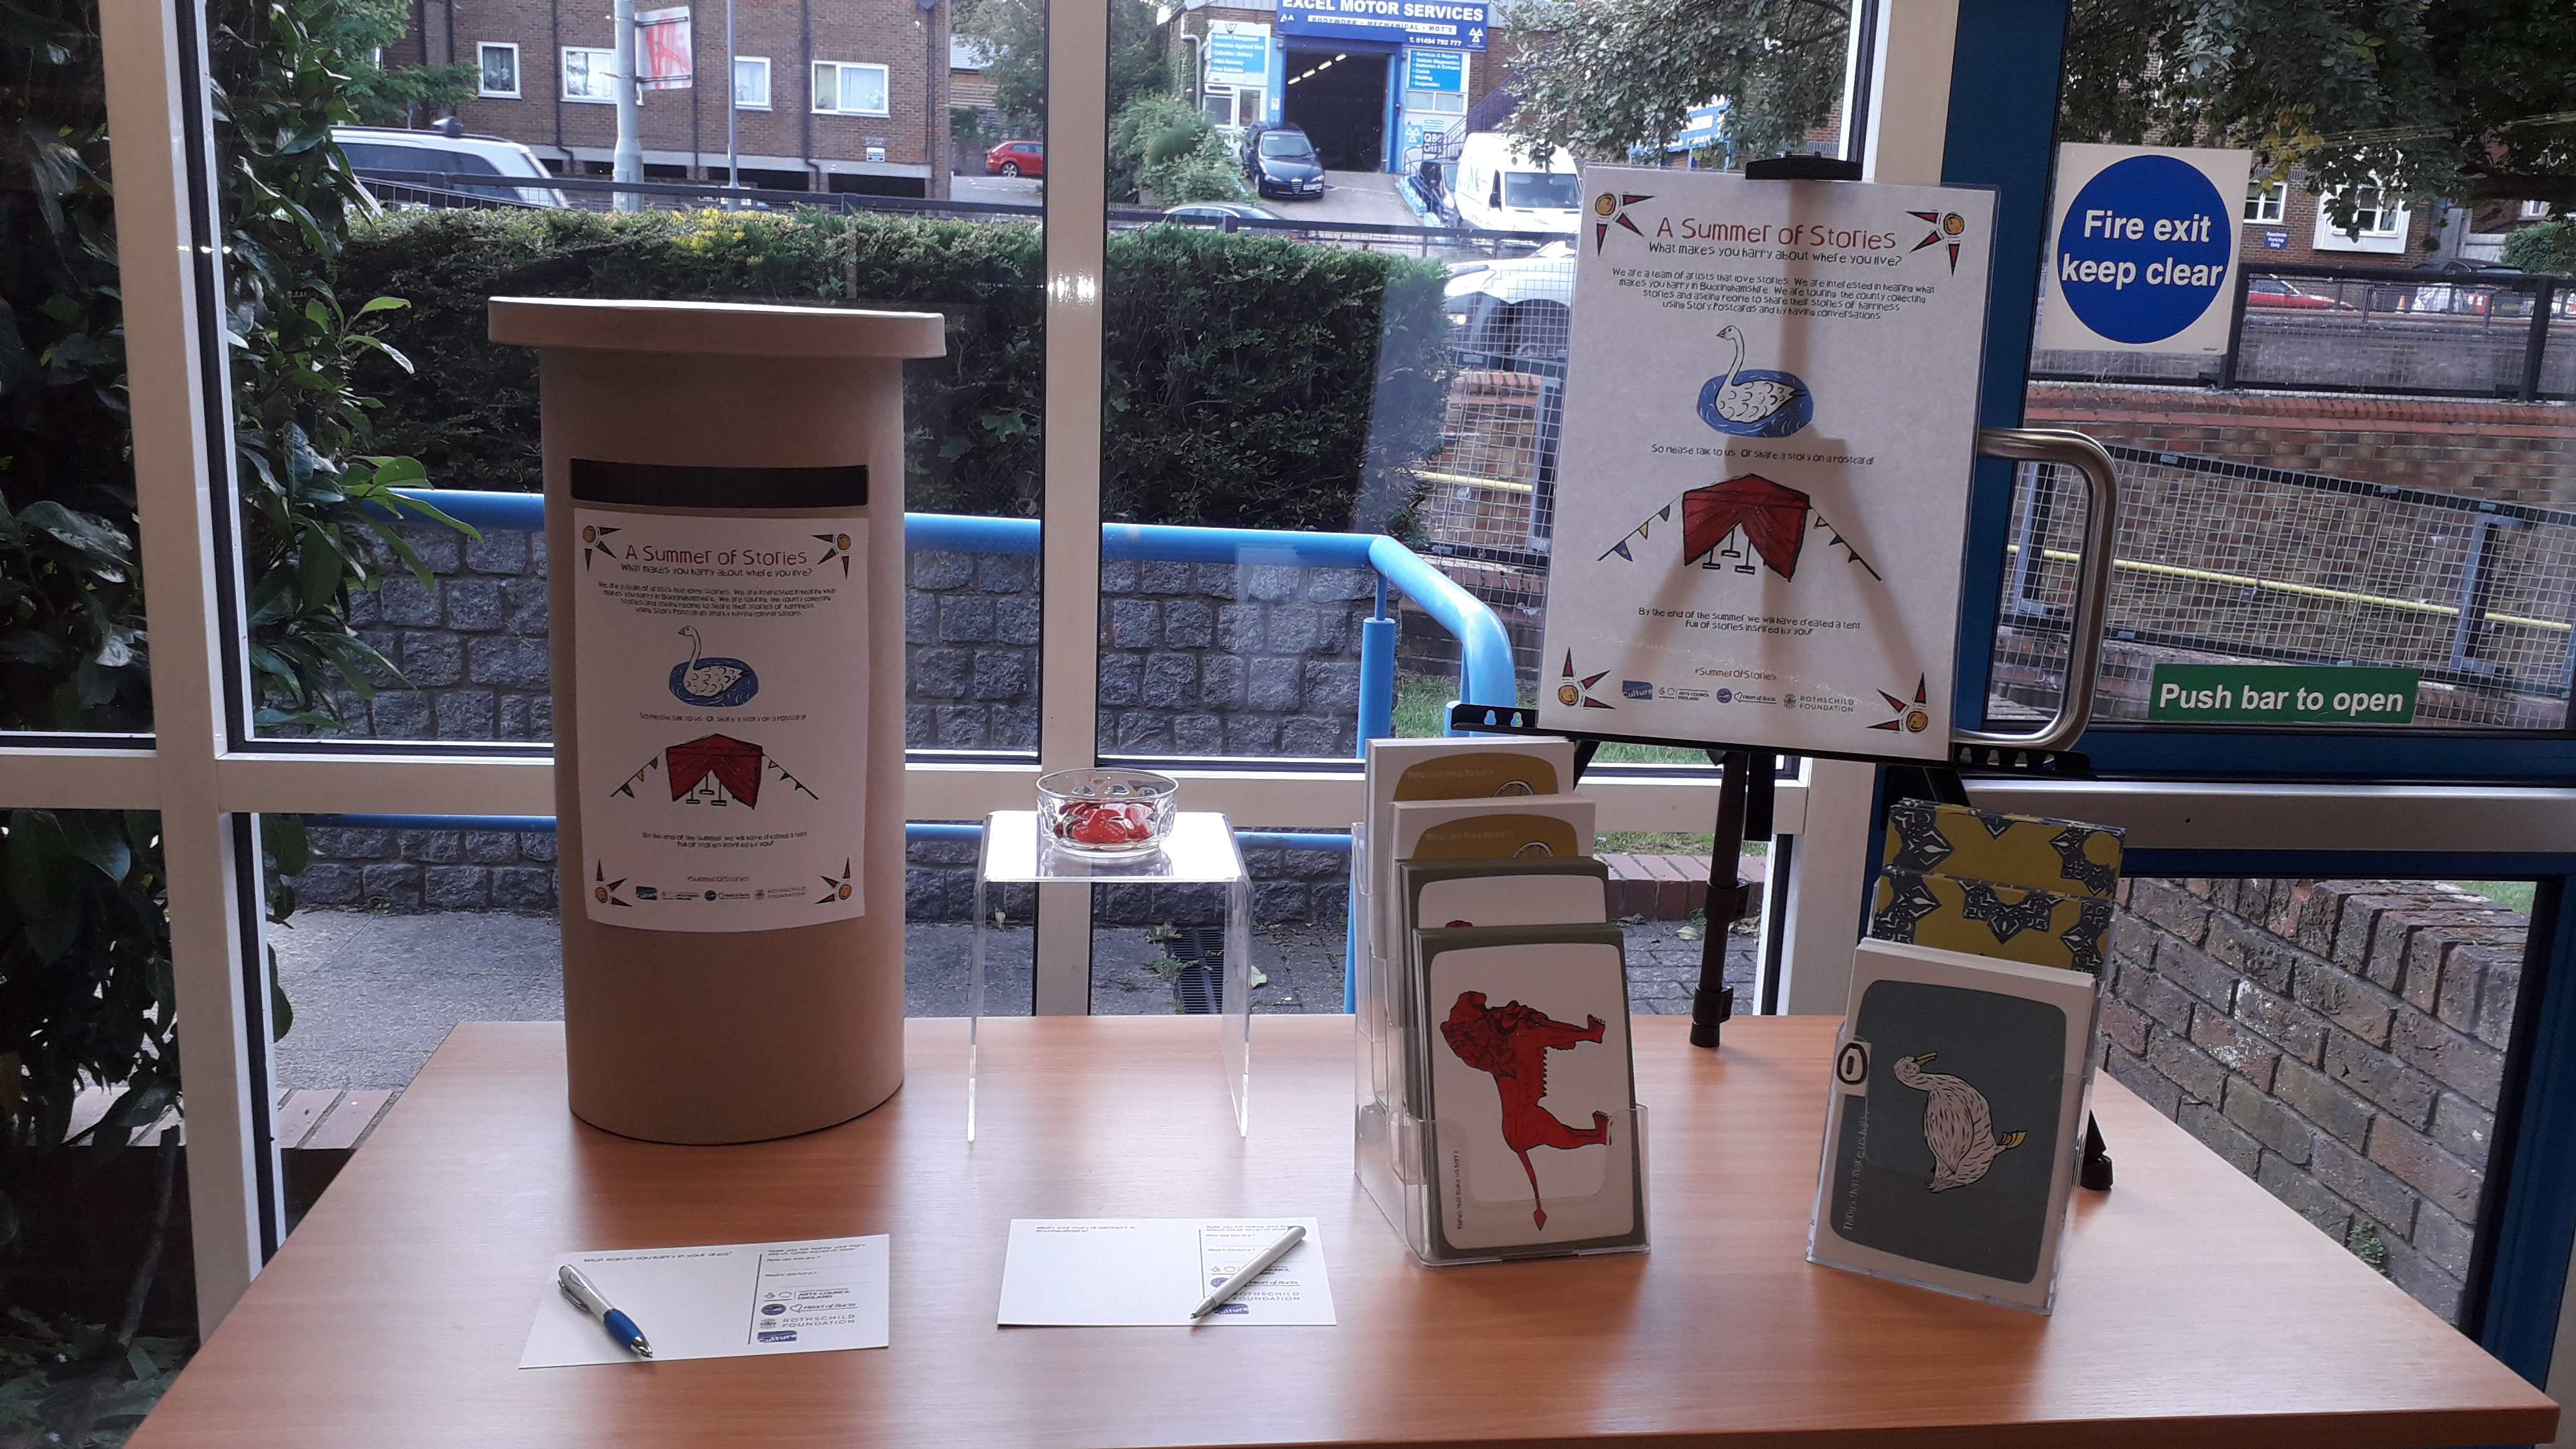 Image of story postcards and cardboard post box display